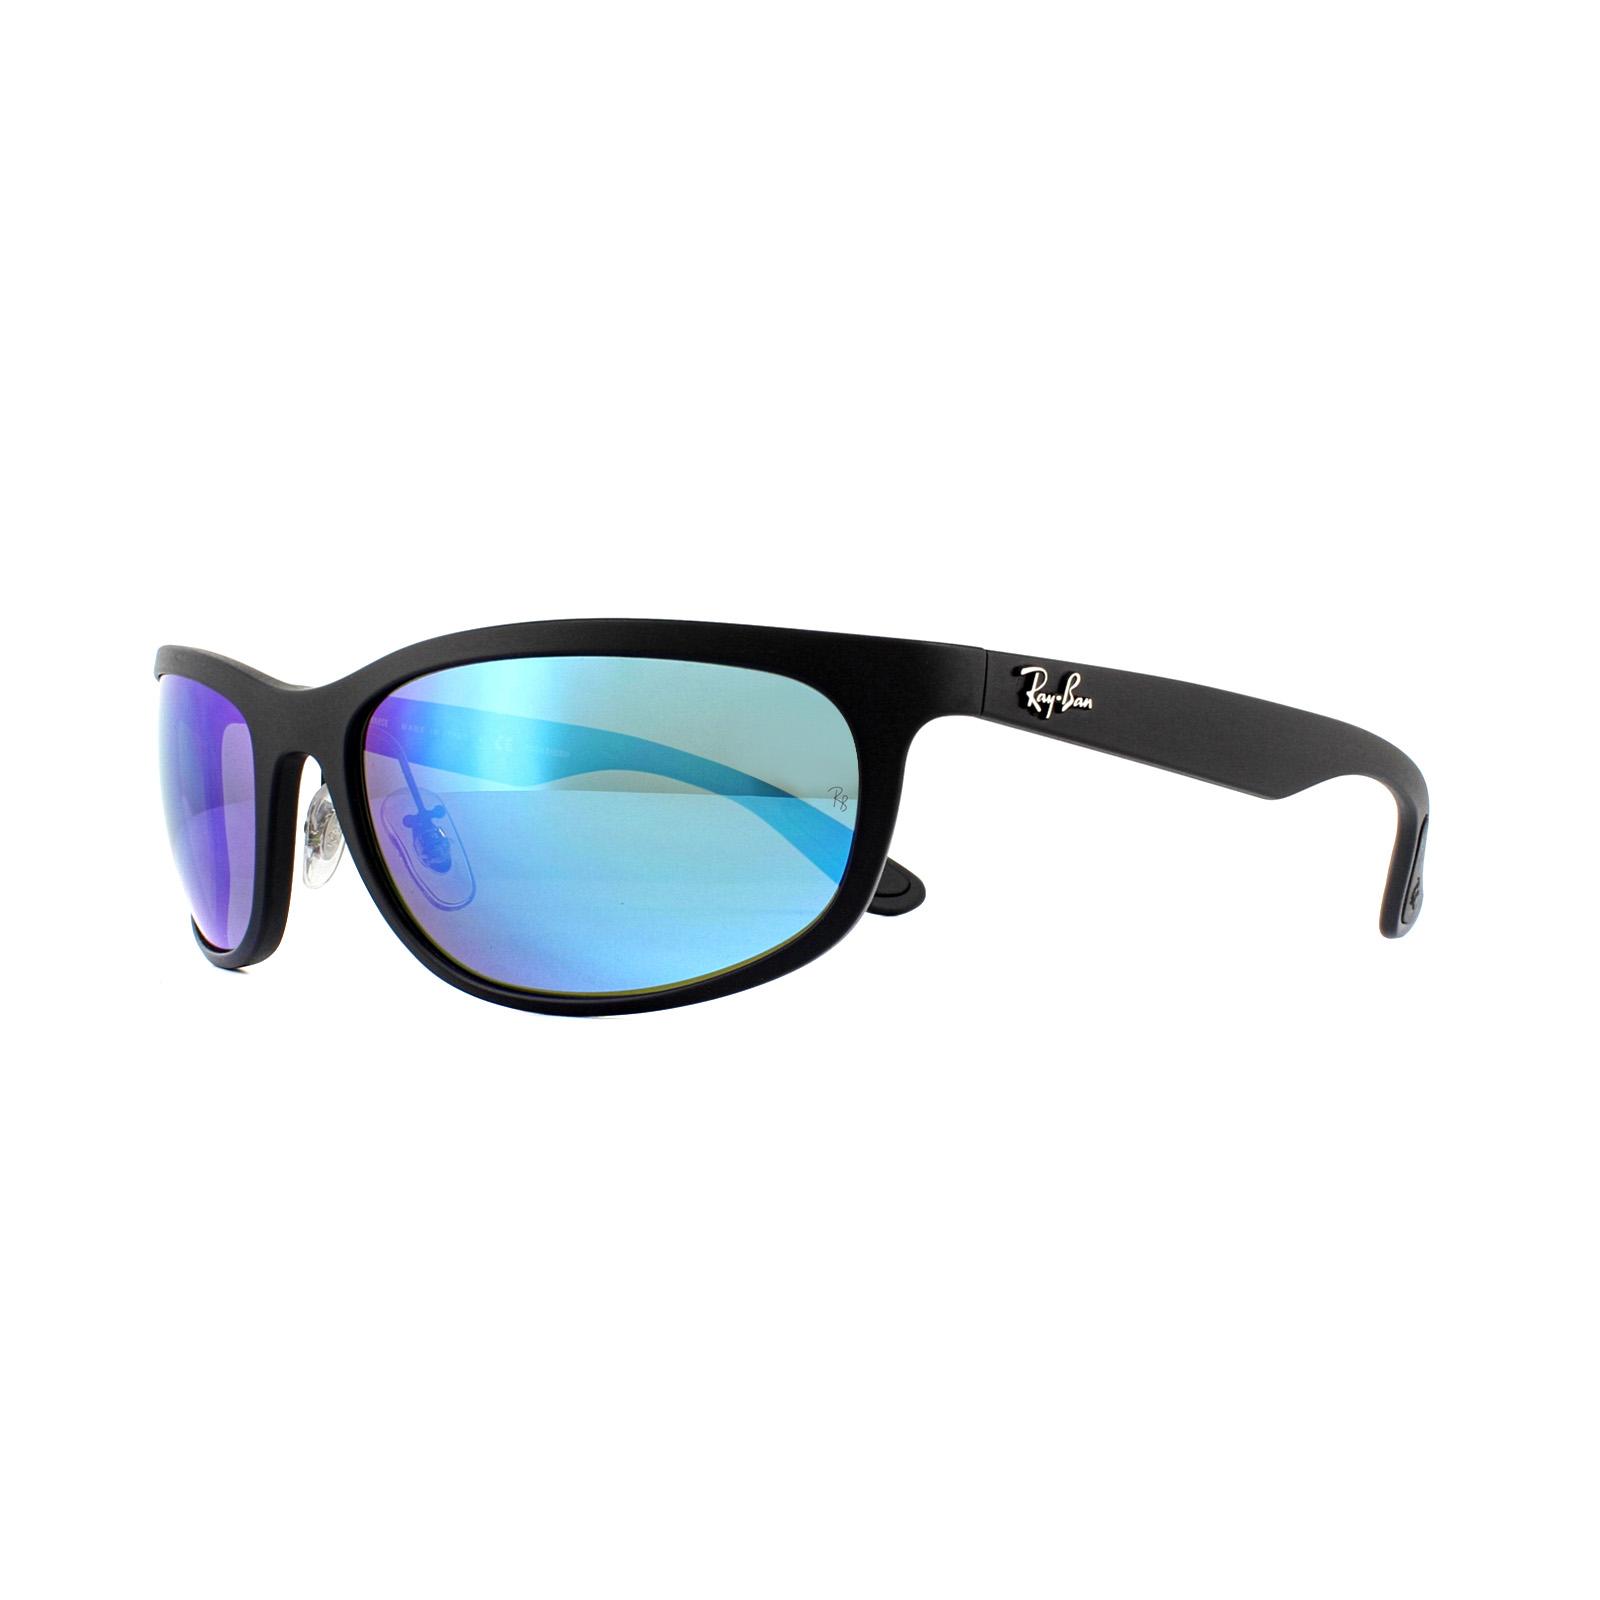 5f87a8fbc7da7 Sentinel Ray-Ban Sunglasses RB4265 601SA1 Black Blue Mirror Chromance  Polarized